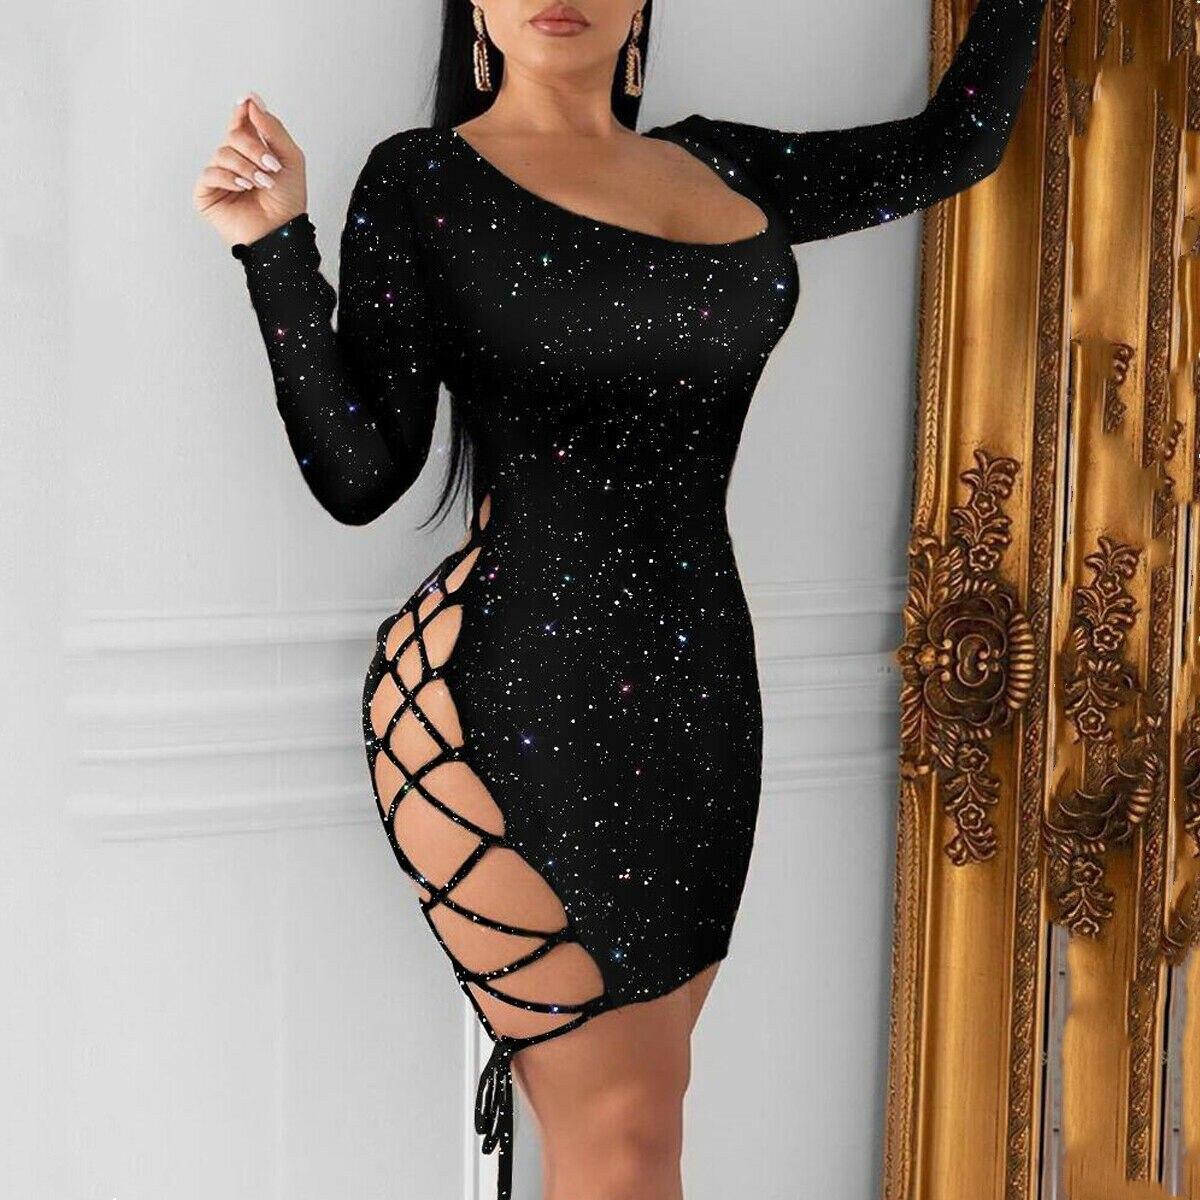 Meihuida Women Sexy Leopard Mini Dress Long Sleeve O-Neck Backless Skinny Stretch Short Dresses Night Club Sex Wear 7